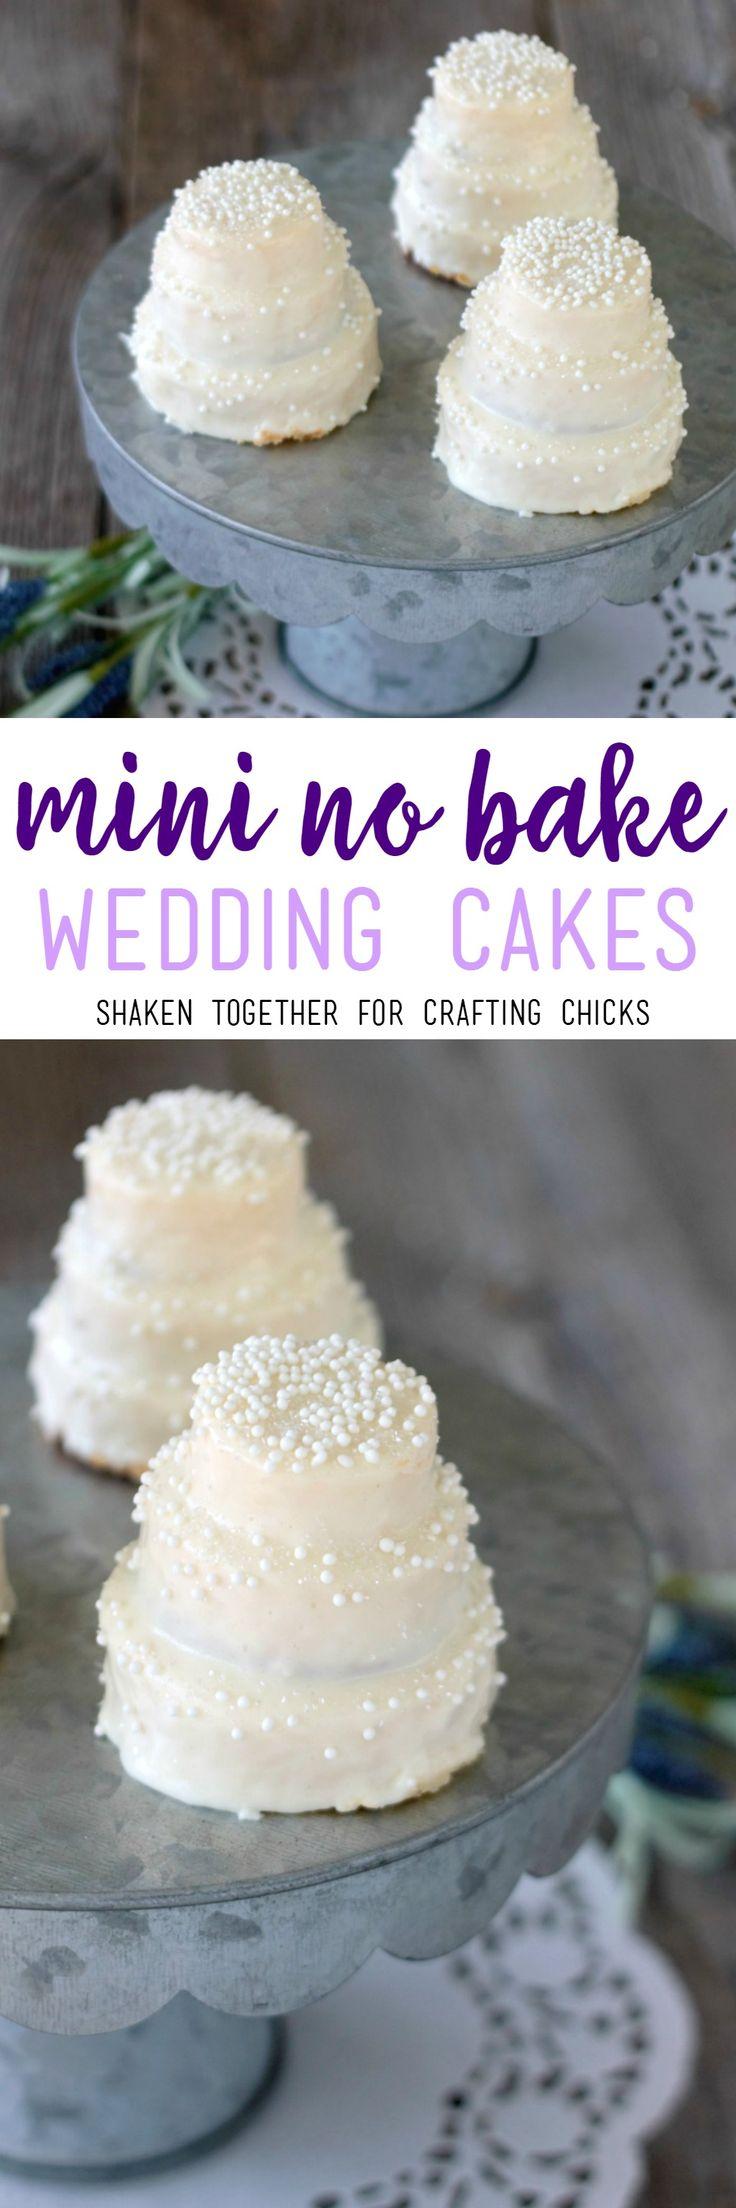 Mini No Bake Wedding Cakes 164 best